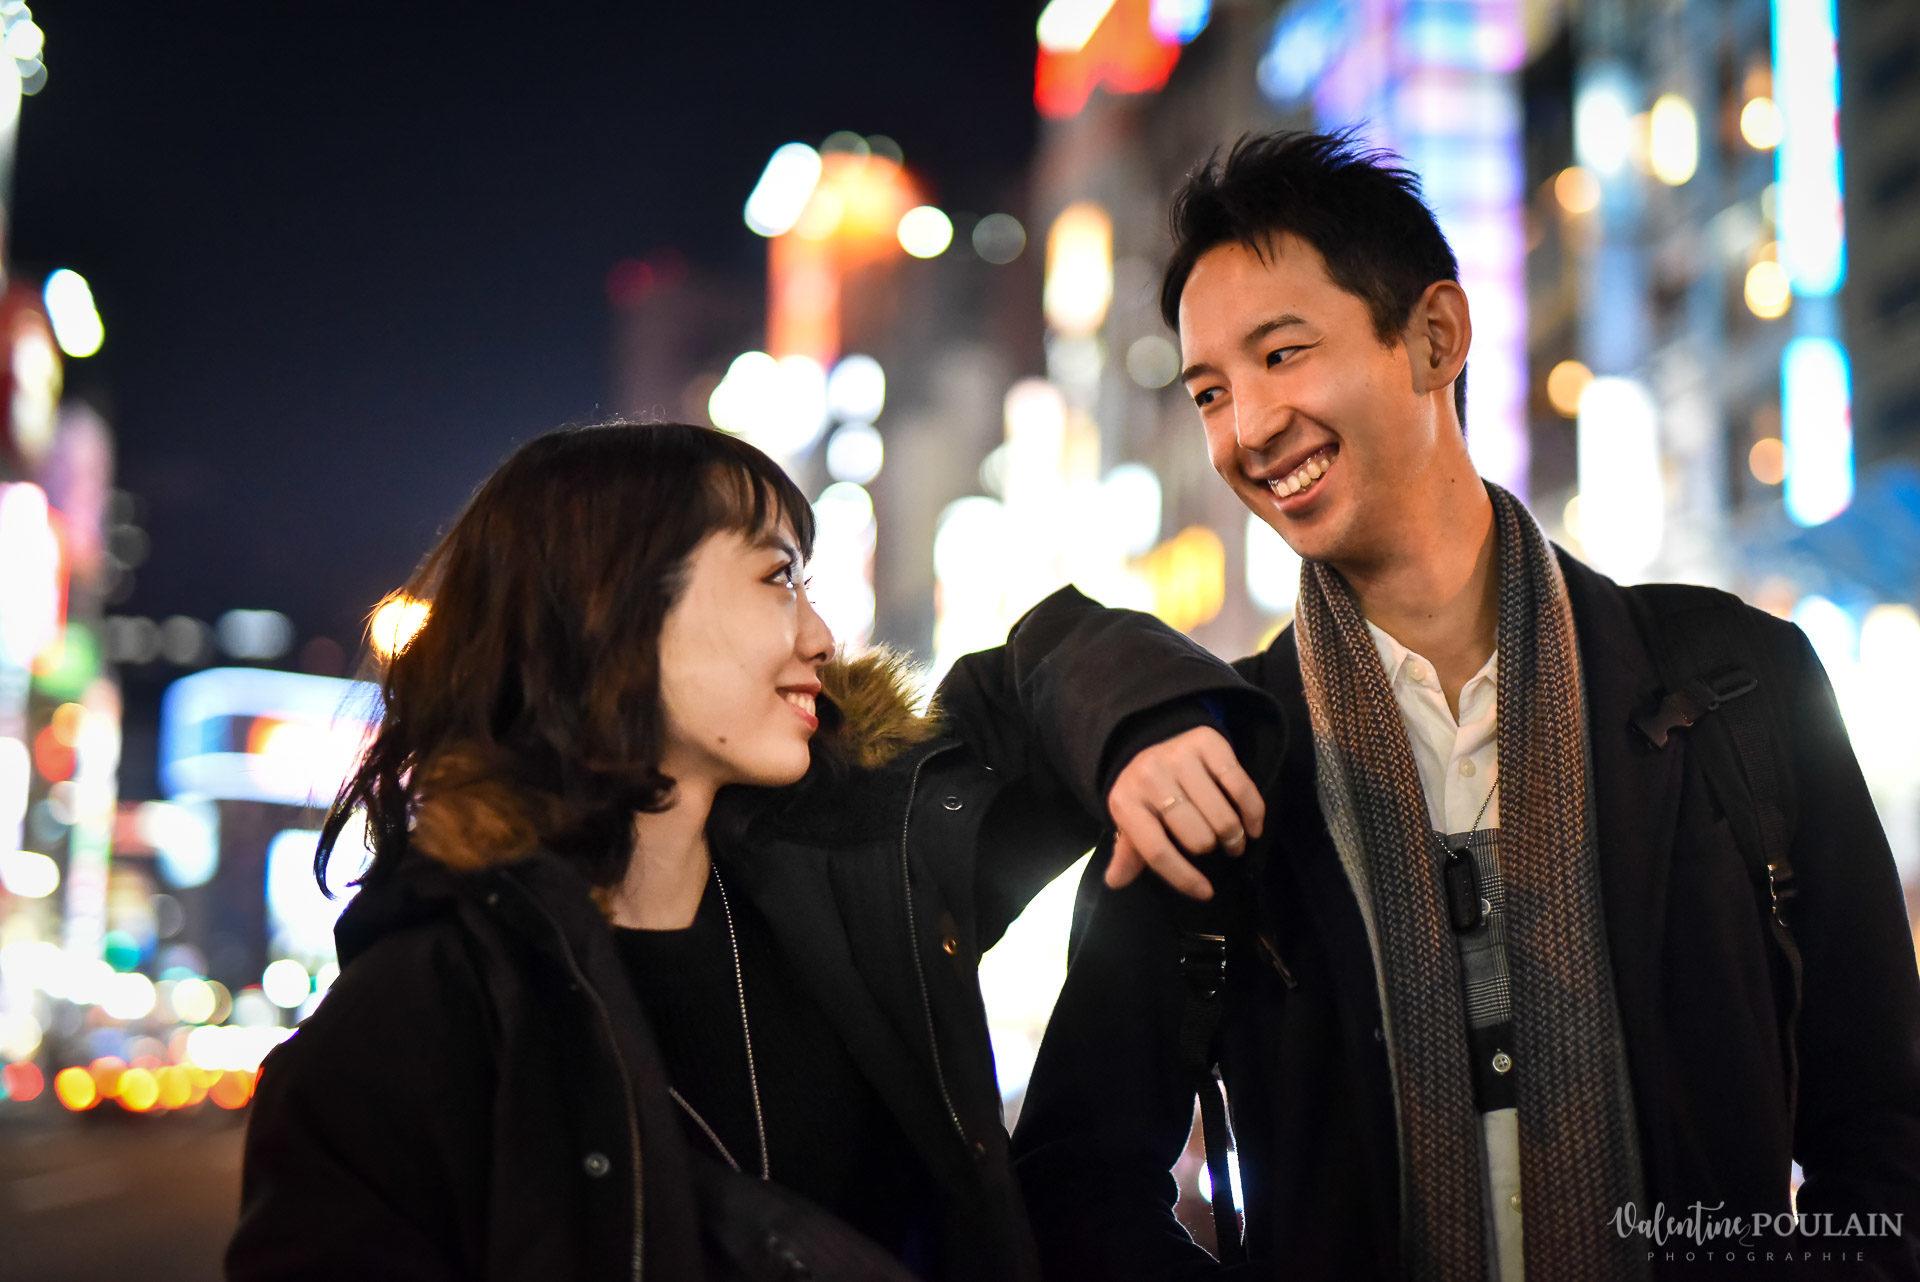 Shooting couple Japon Tokyo - Valentine Poulain lights